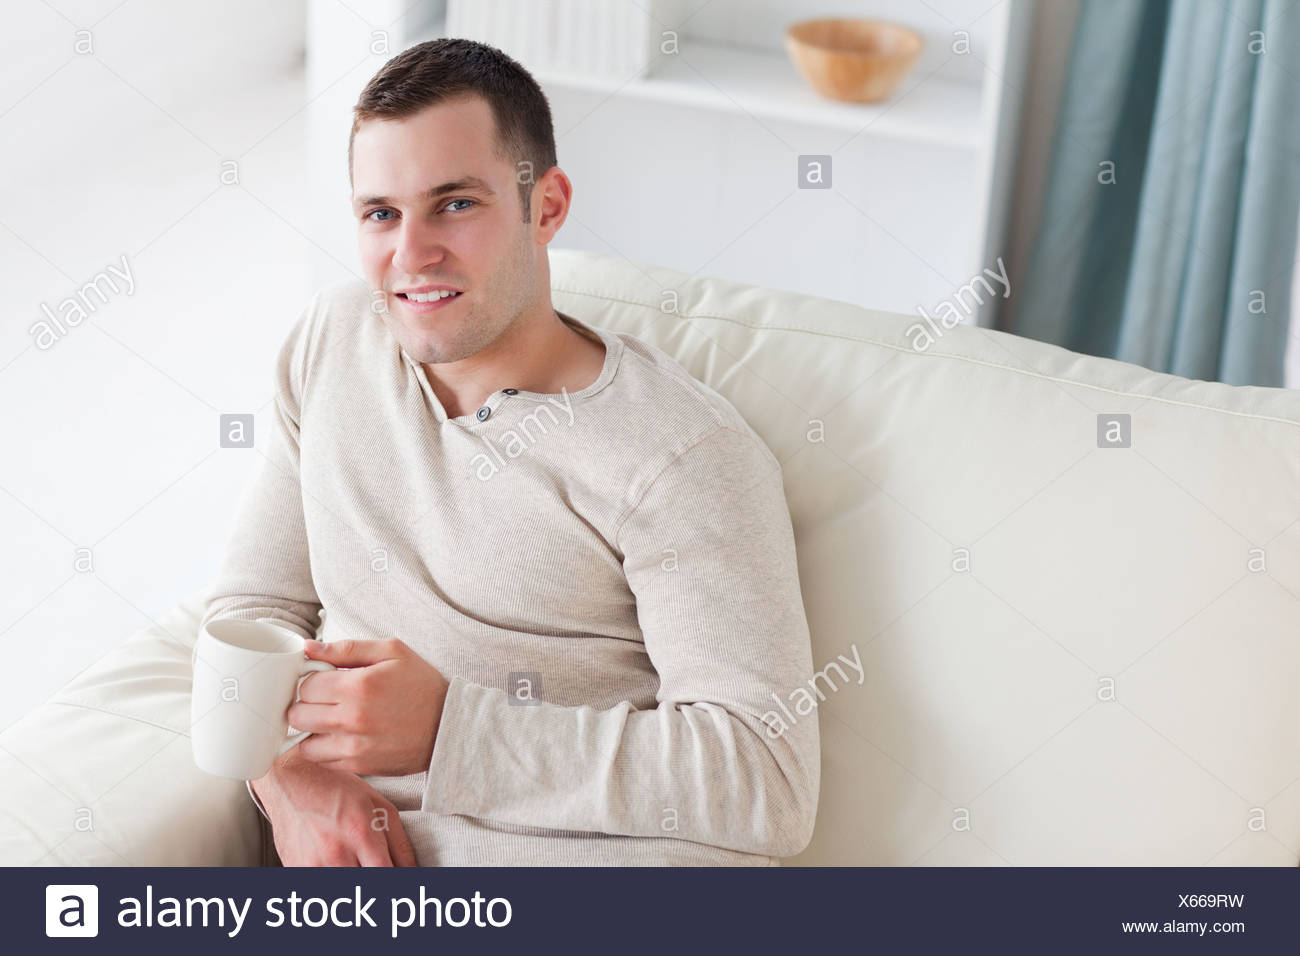 Joven atractivo tomando un café Imagen De Stock